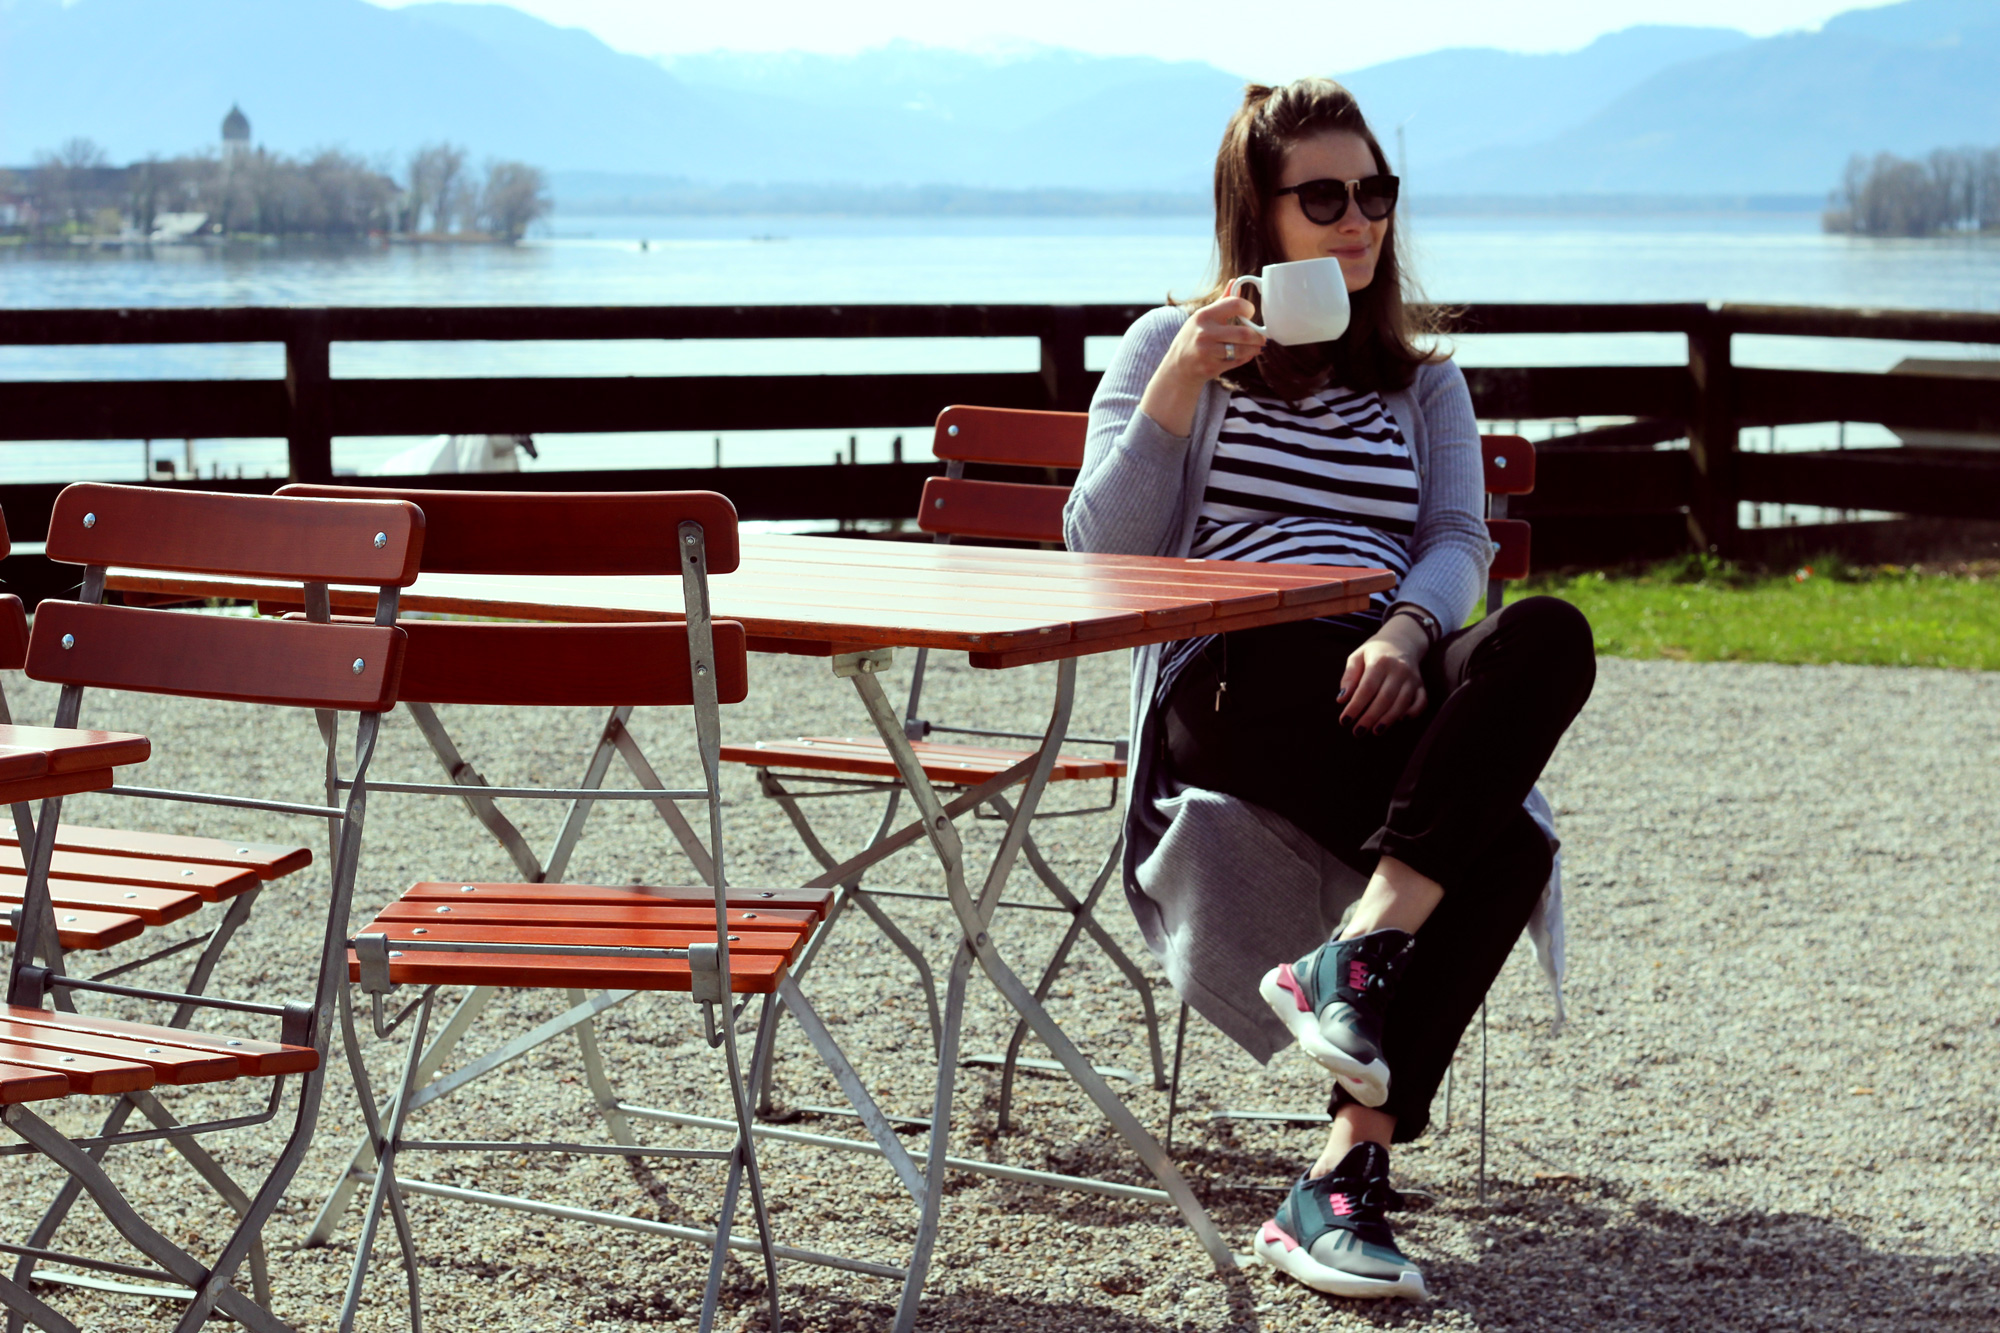 Cheimsee-lake-Bayern-weekend-escape-7